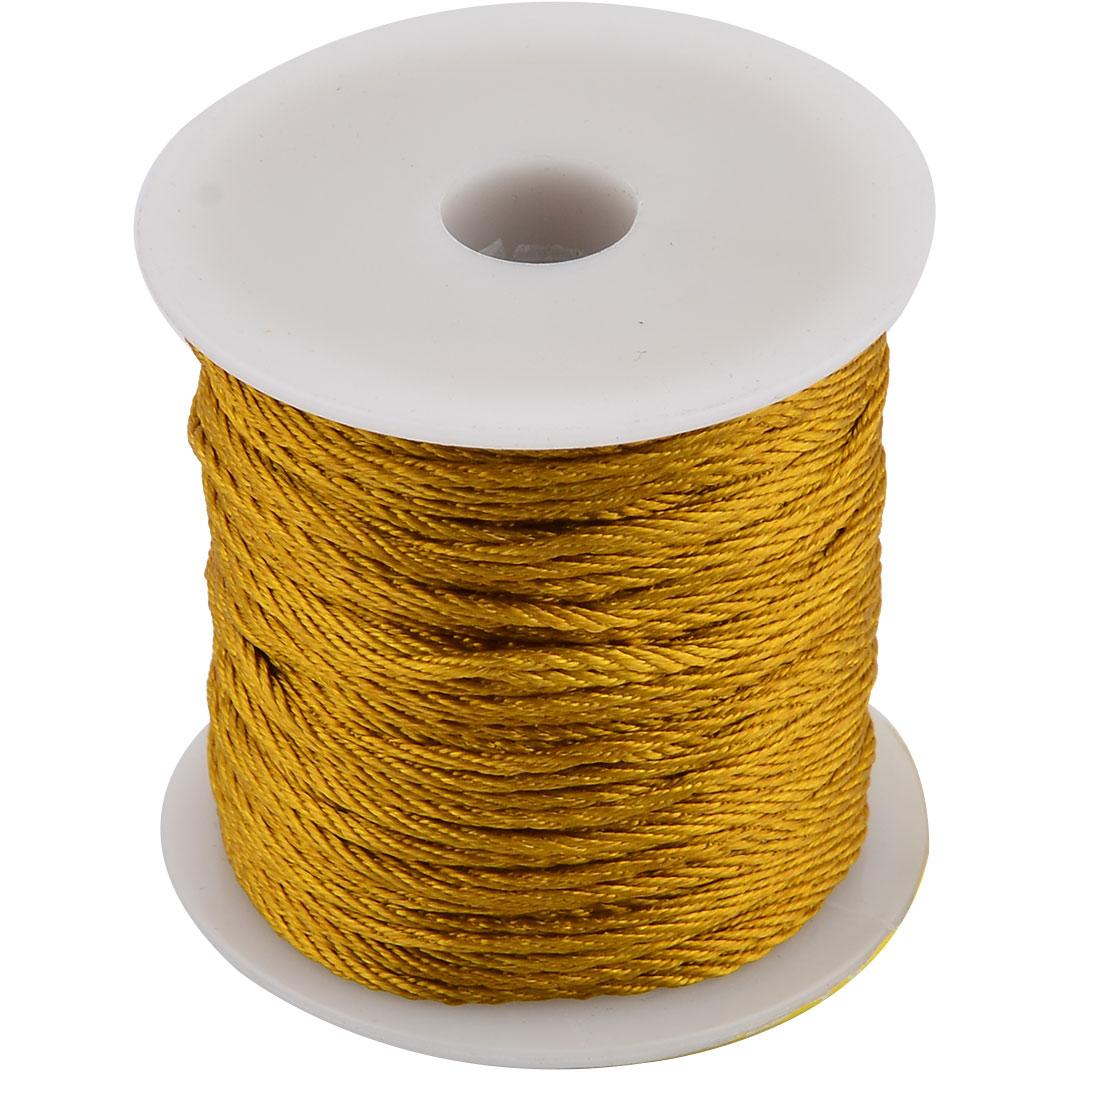 Nylon Handicraft DIY Chinese Knot Bracelet Cord String Olive Yellow 55 Yards